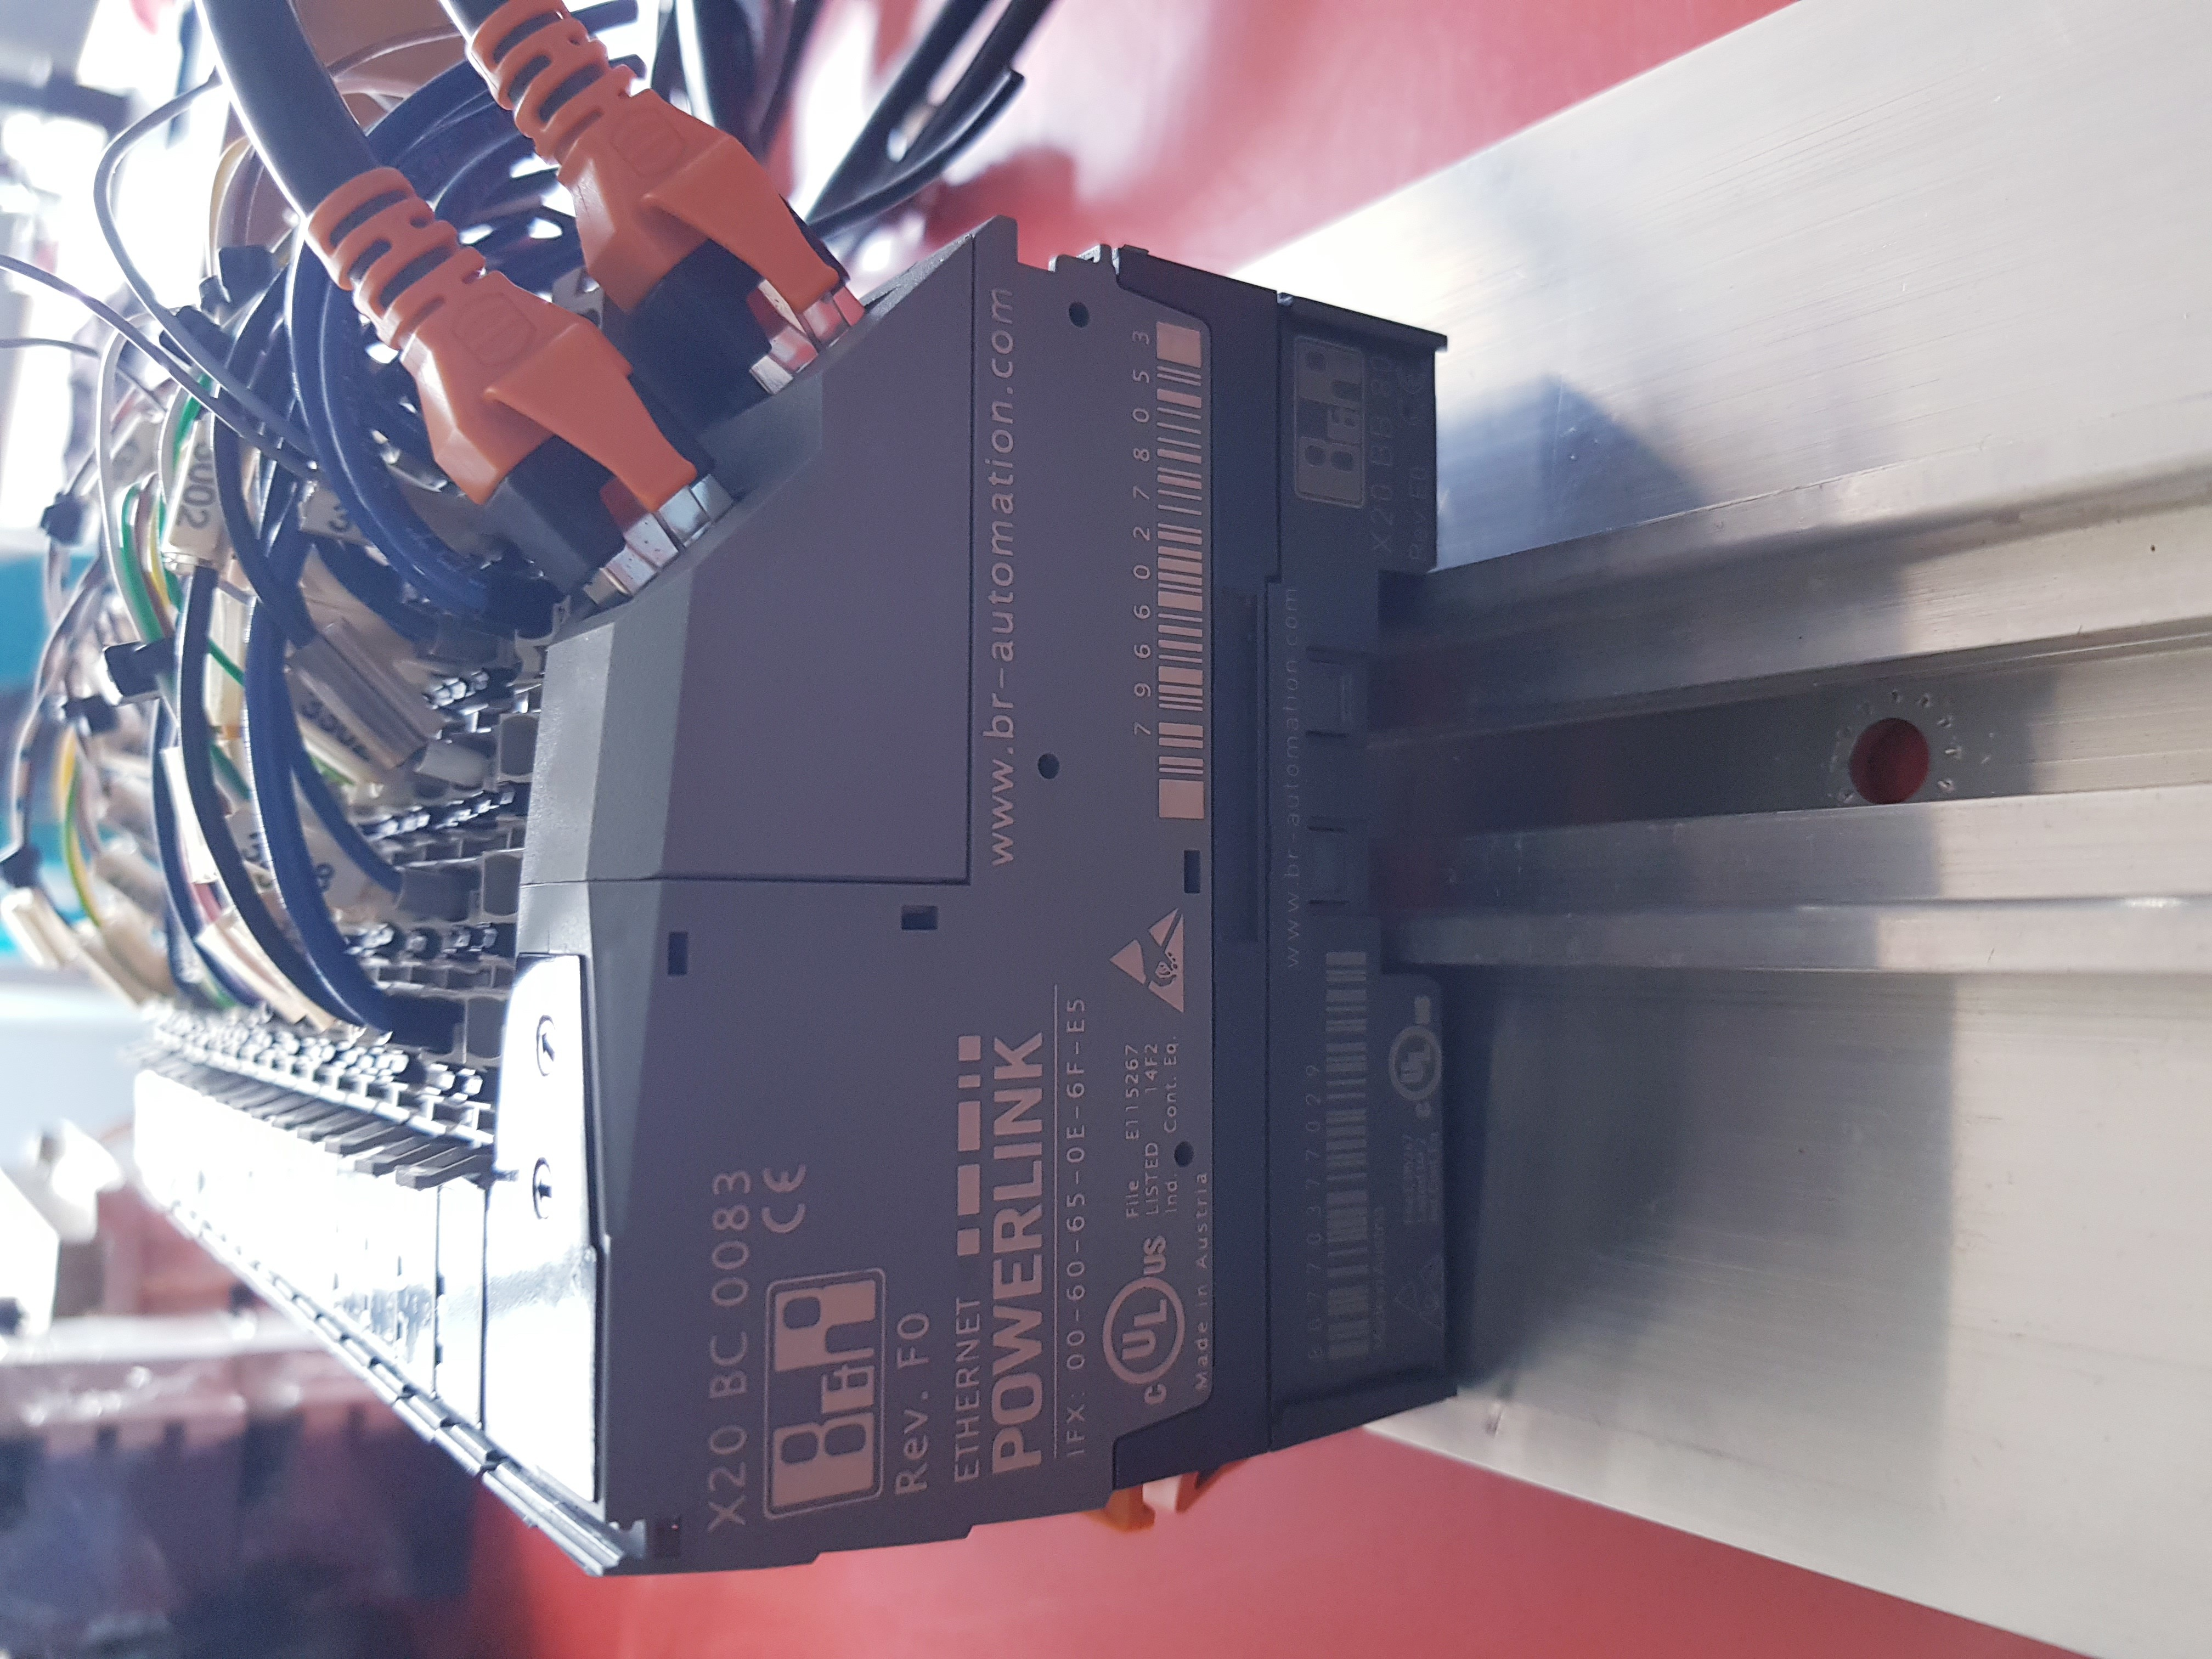 X20 BC 0083 PLC